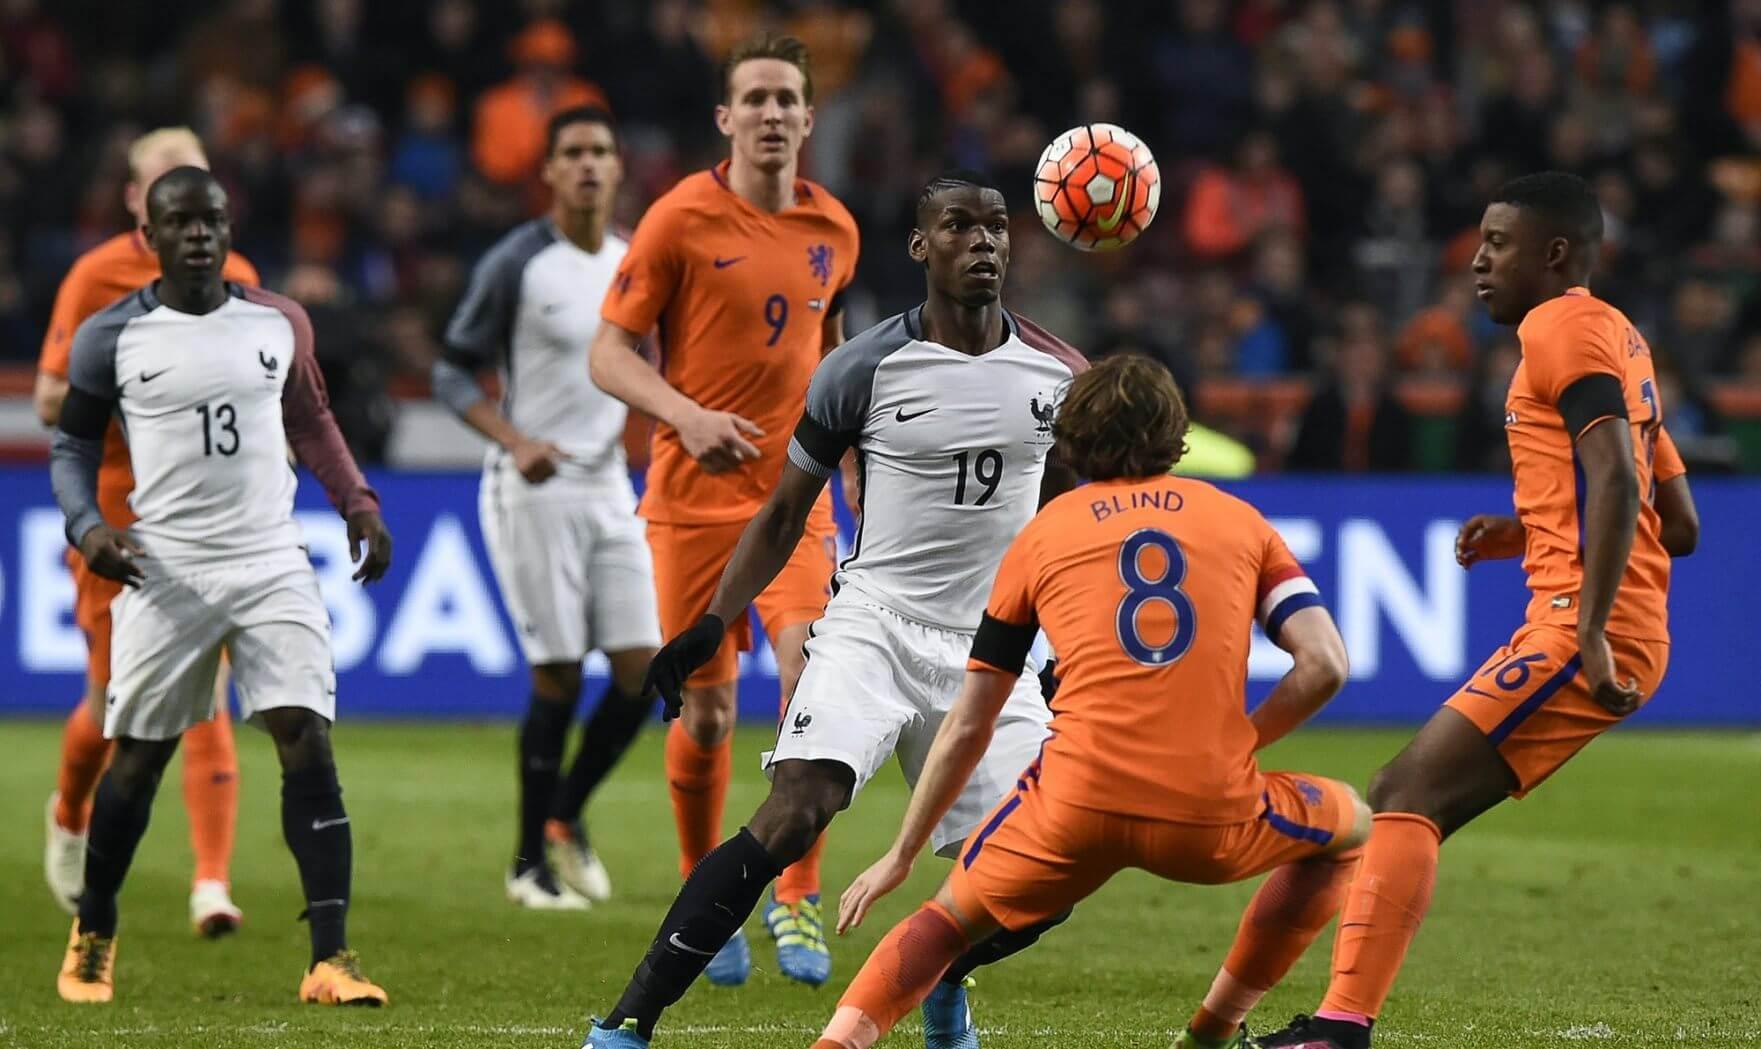 Francja vs Holandia